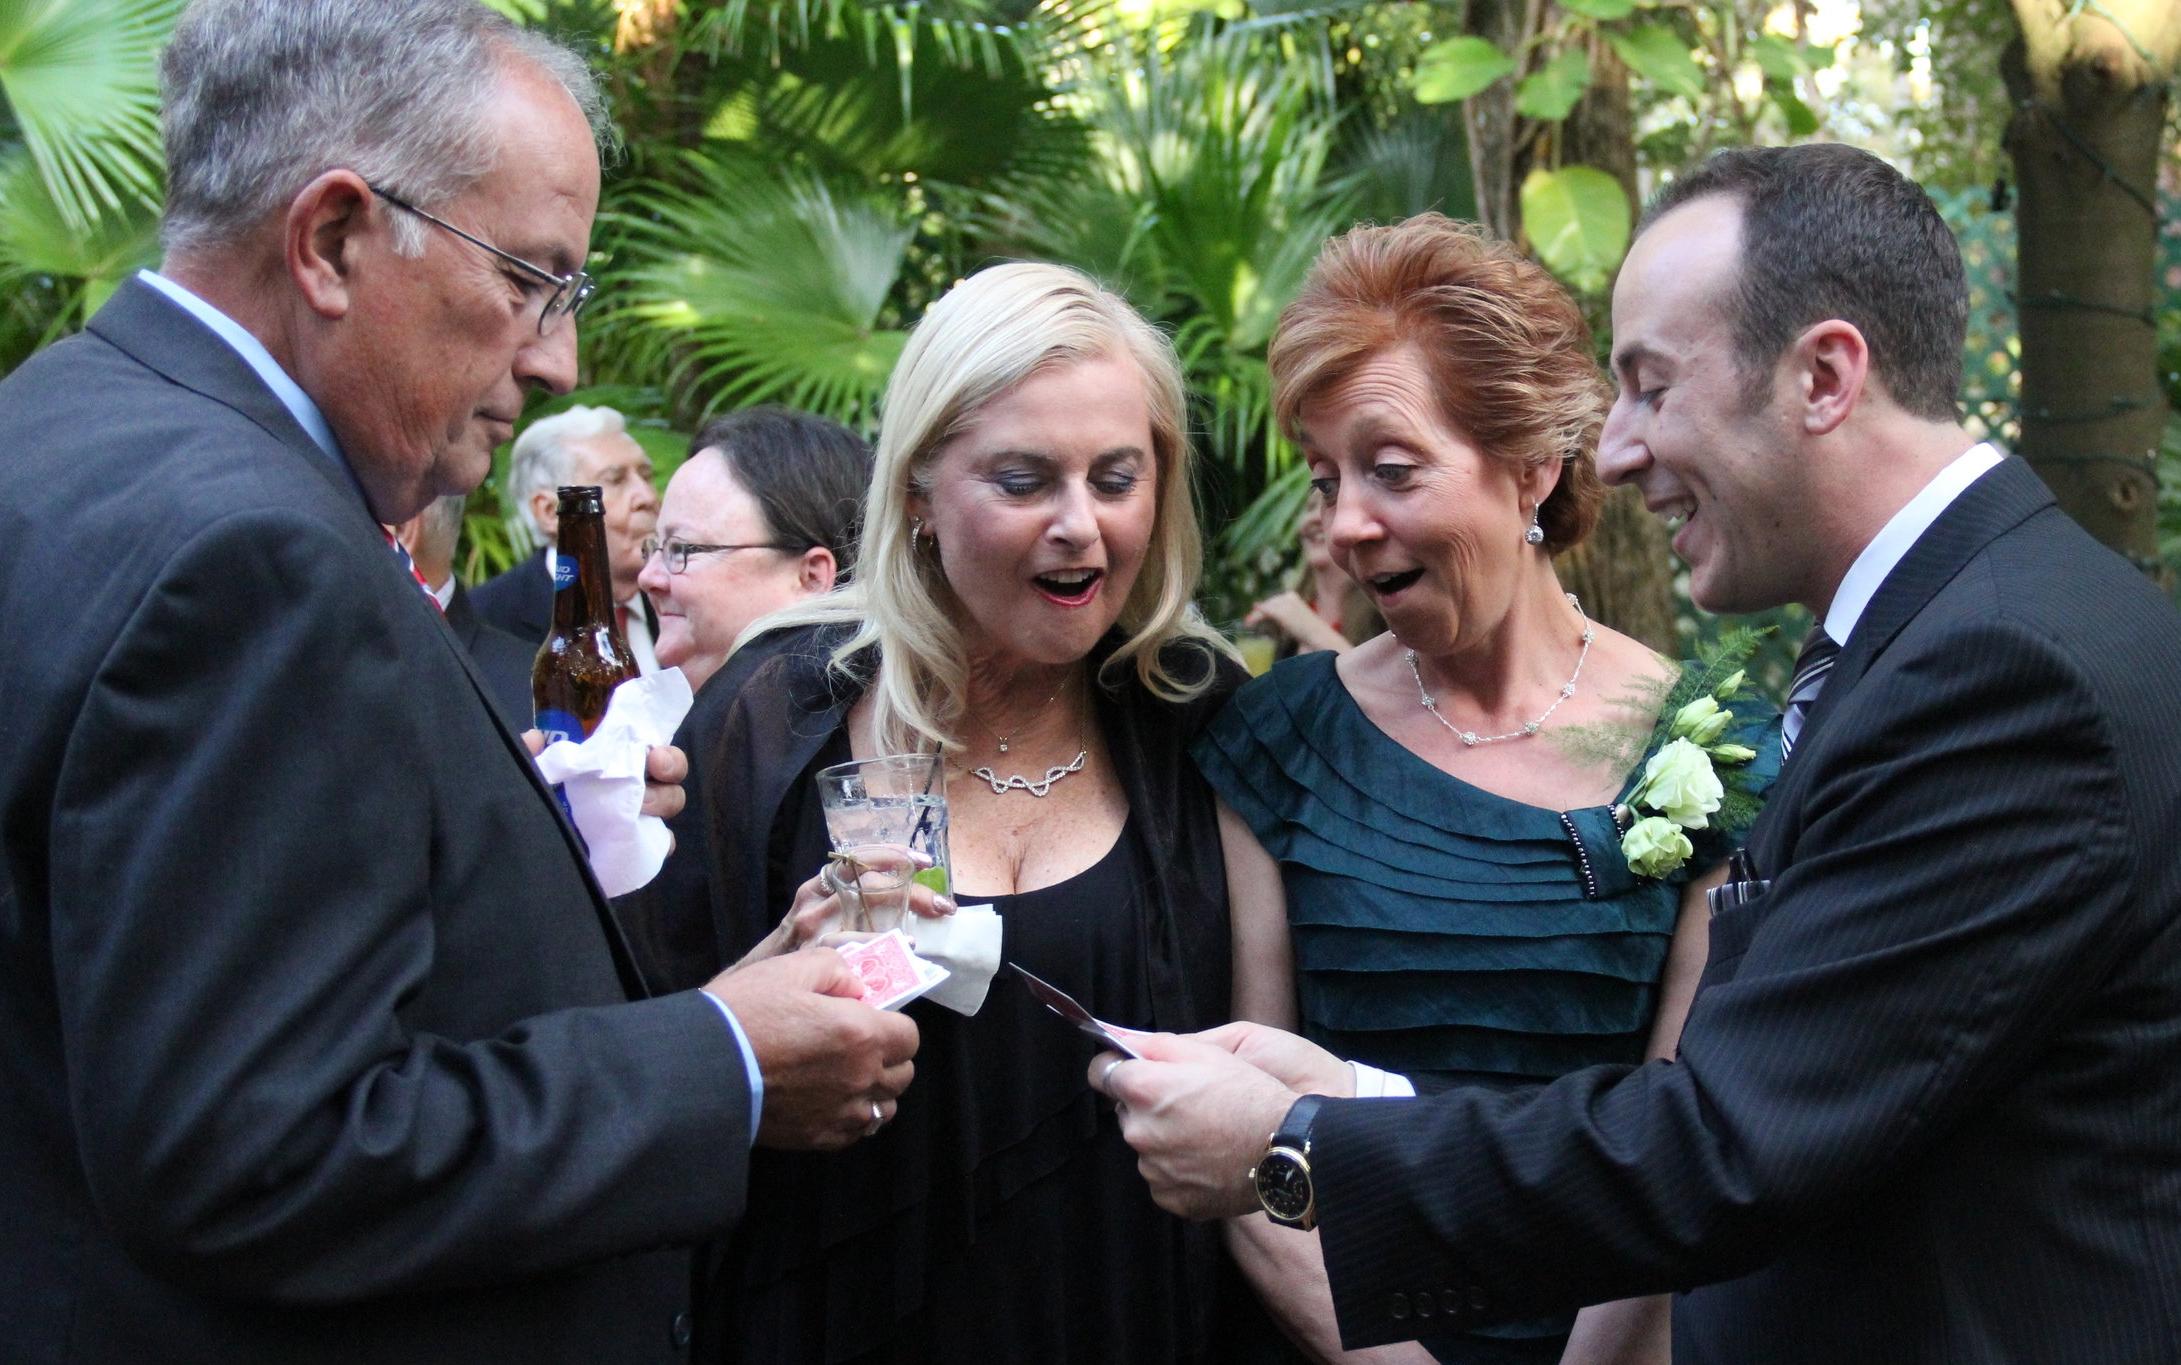 Orlando magician Kostya Kimlat performs at weddings during cocktail hour